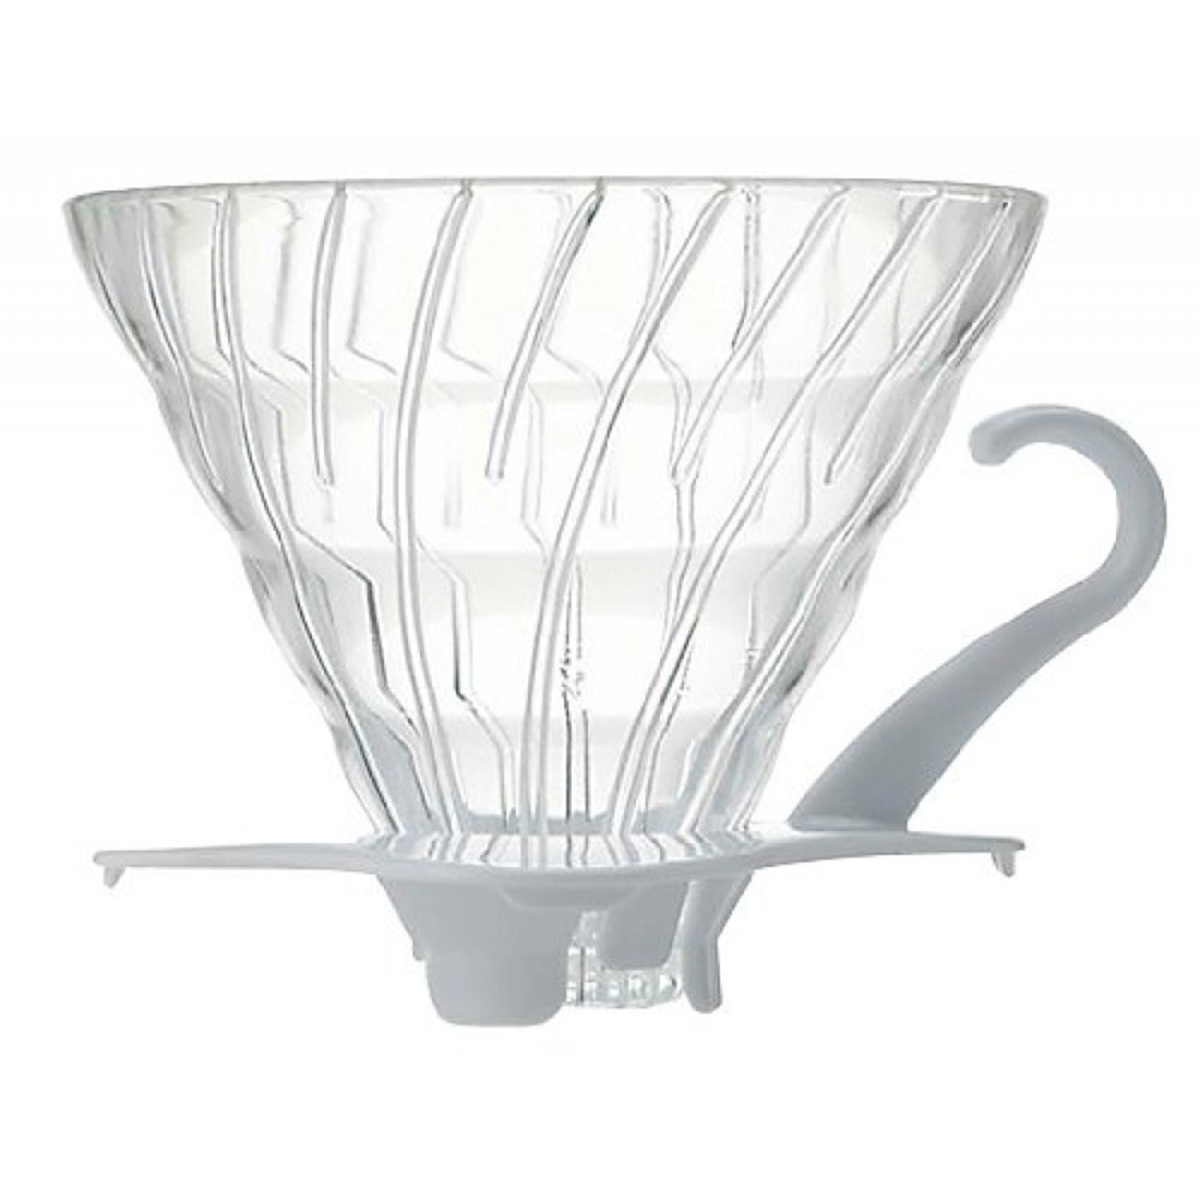 Hario V60 Glass Coffee Dripper 01 - White VDG-01W